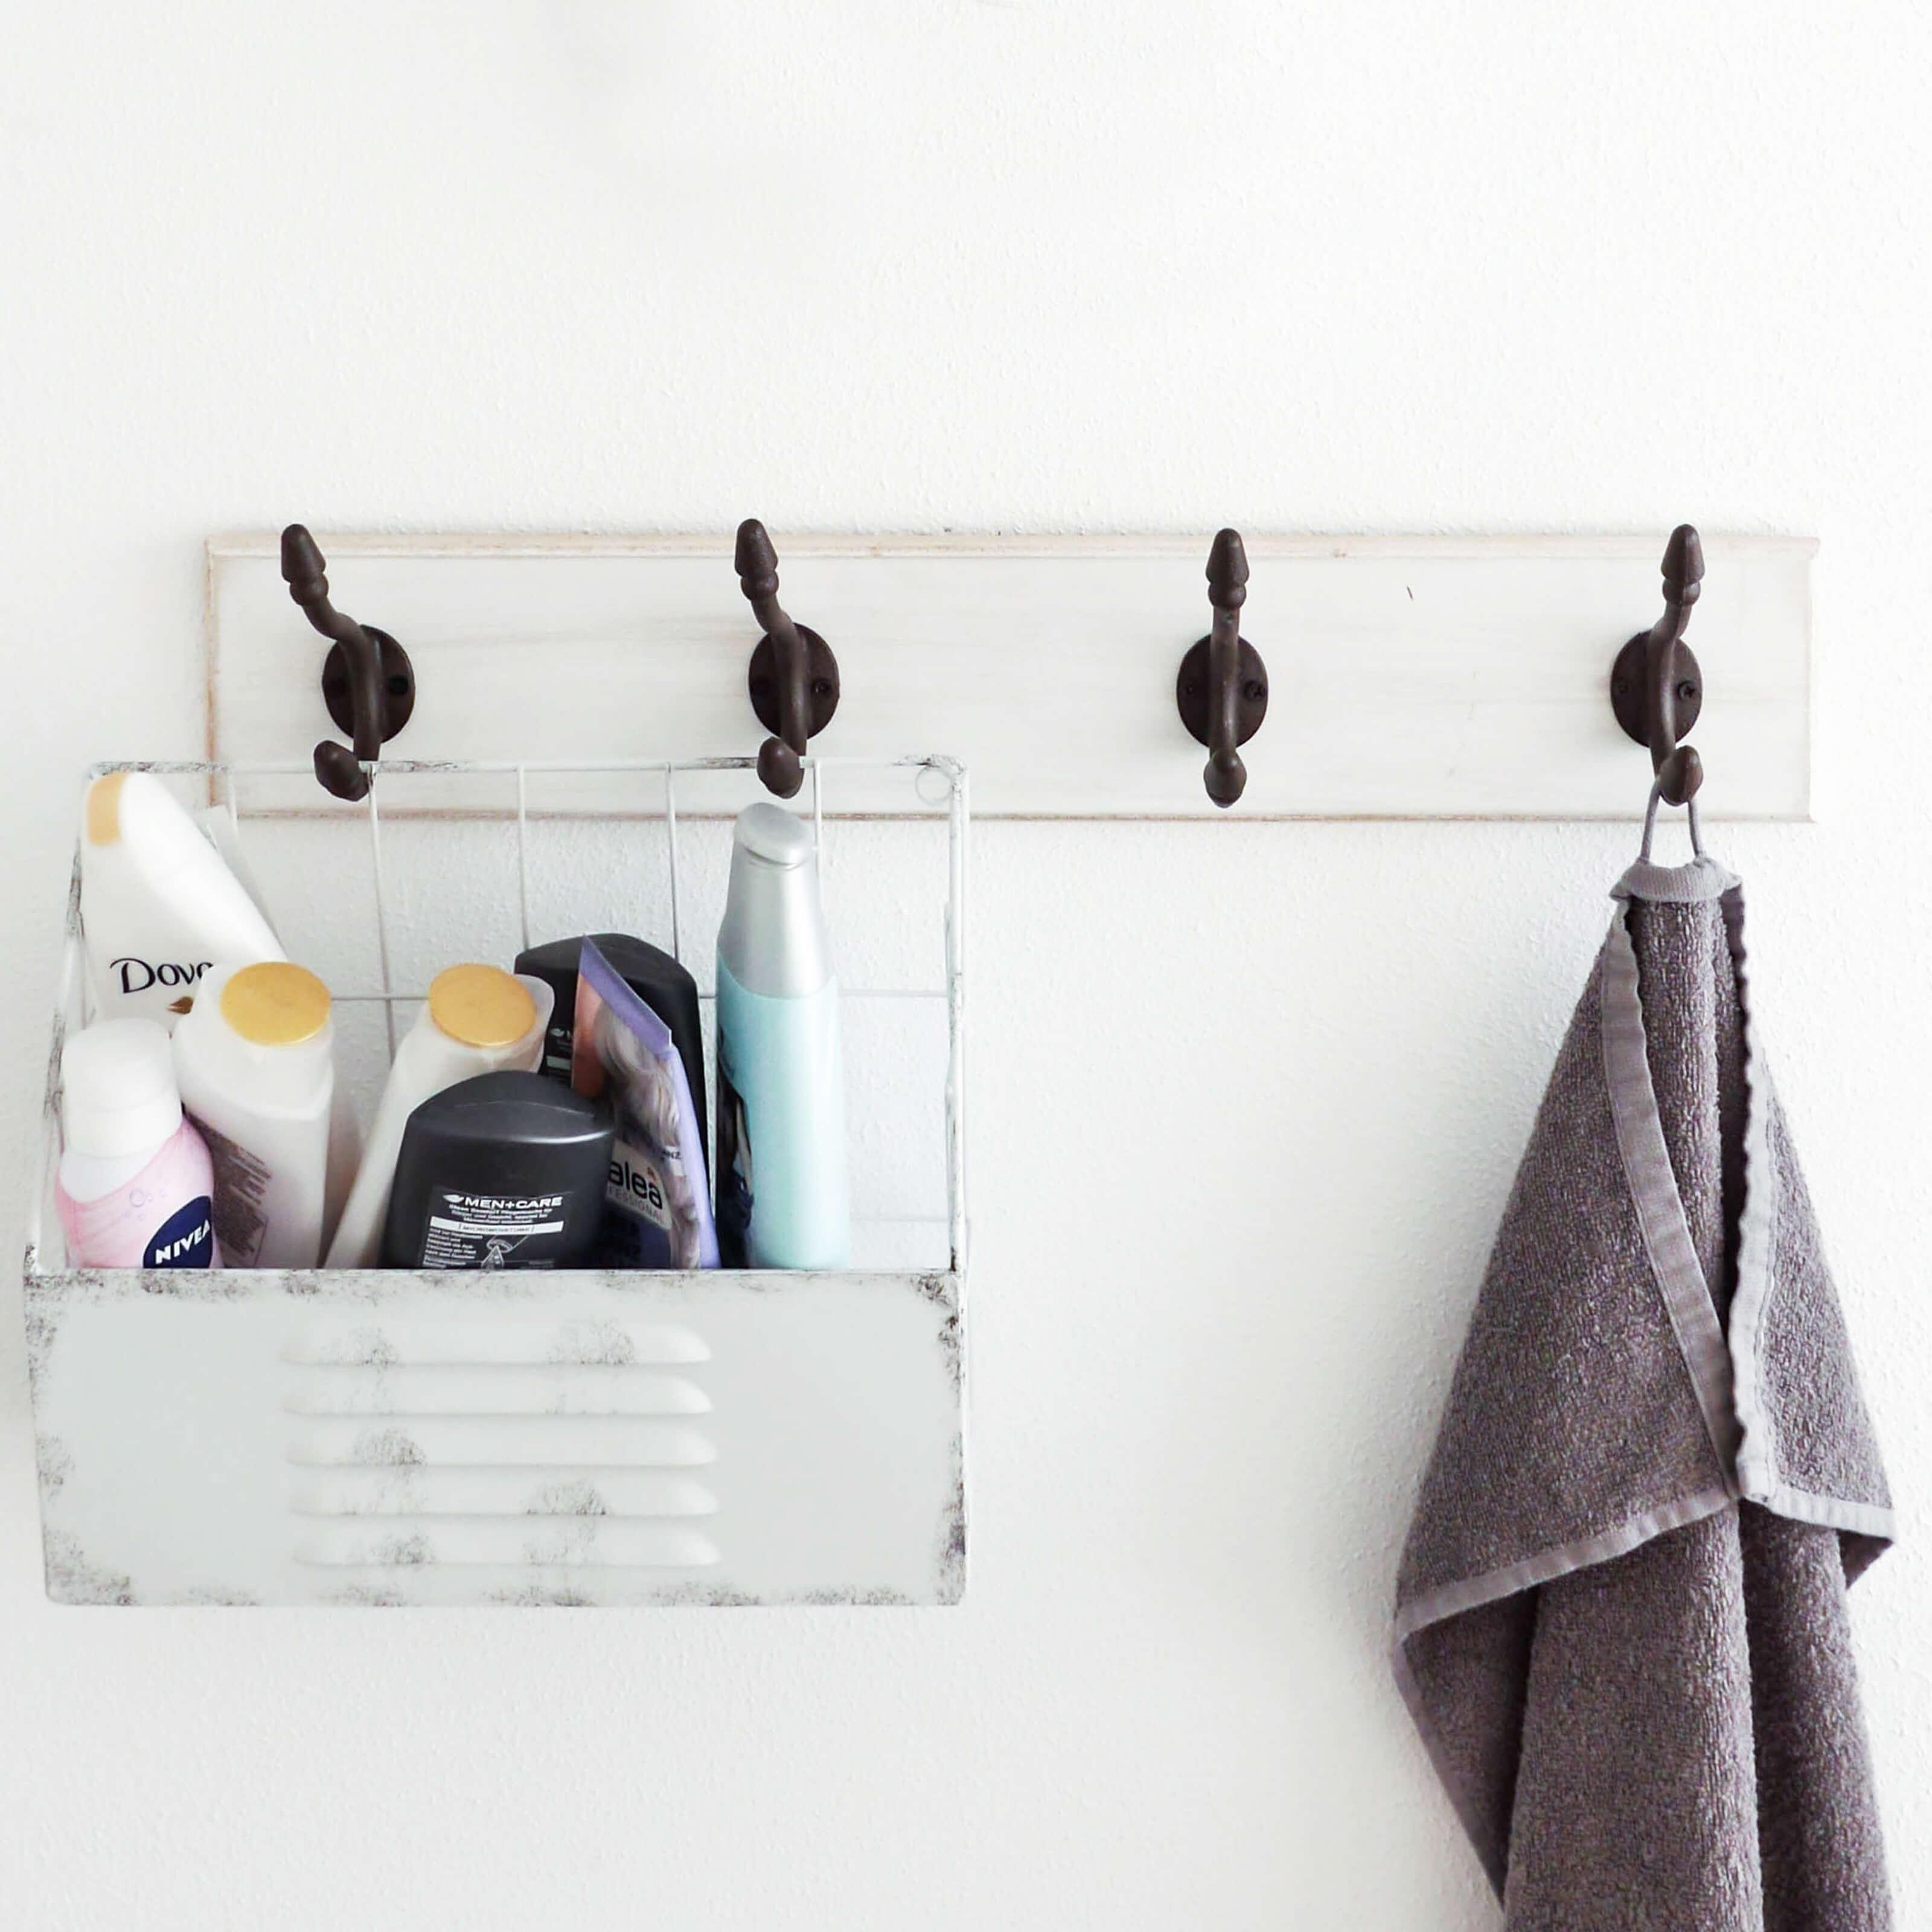 towel rack, shower caddy, shampoo bottles